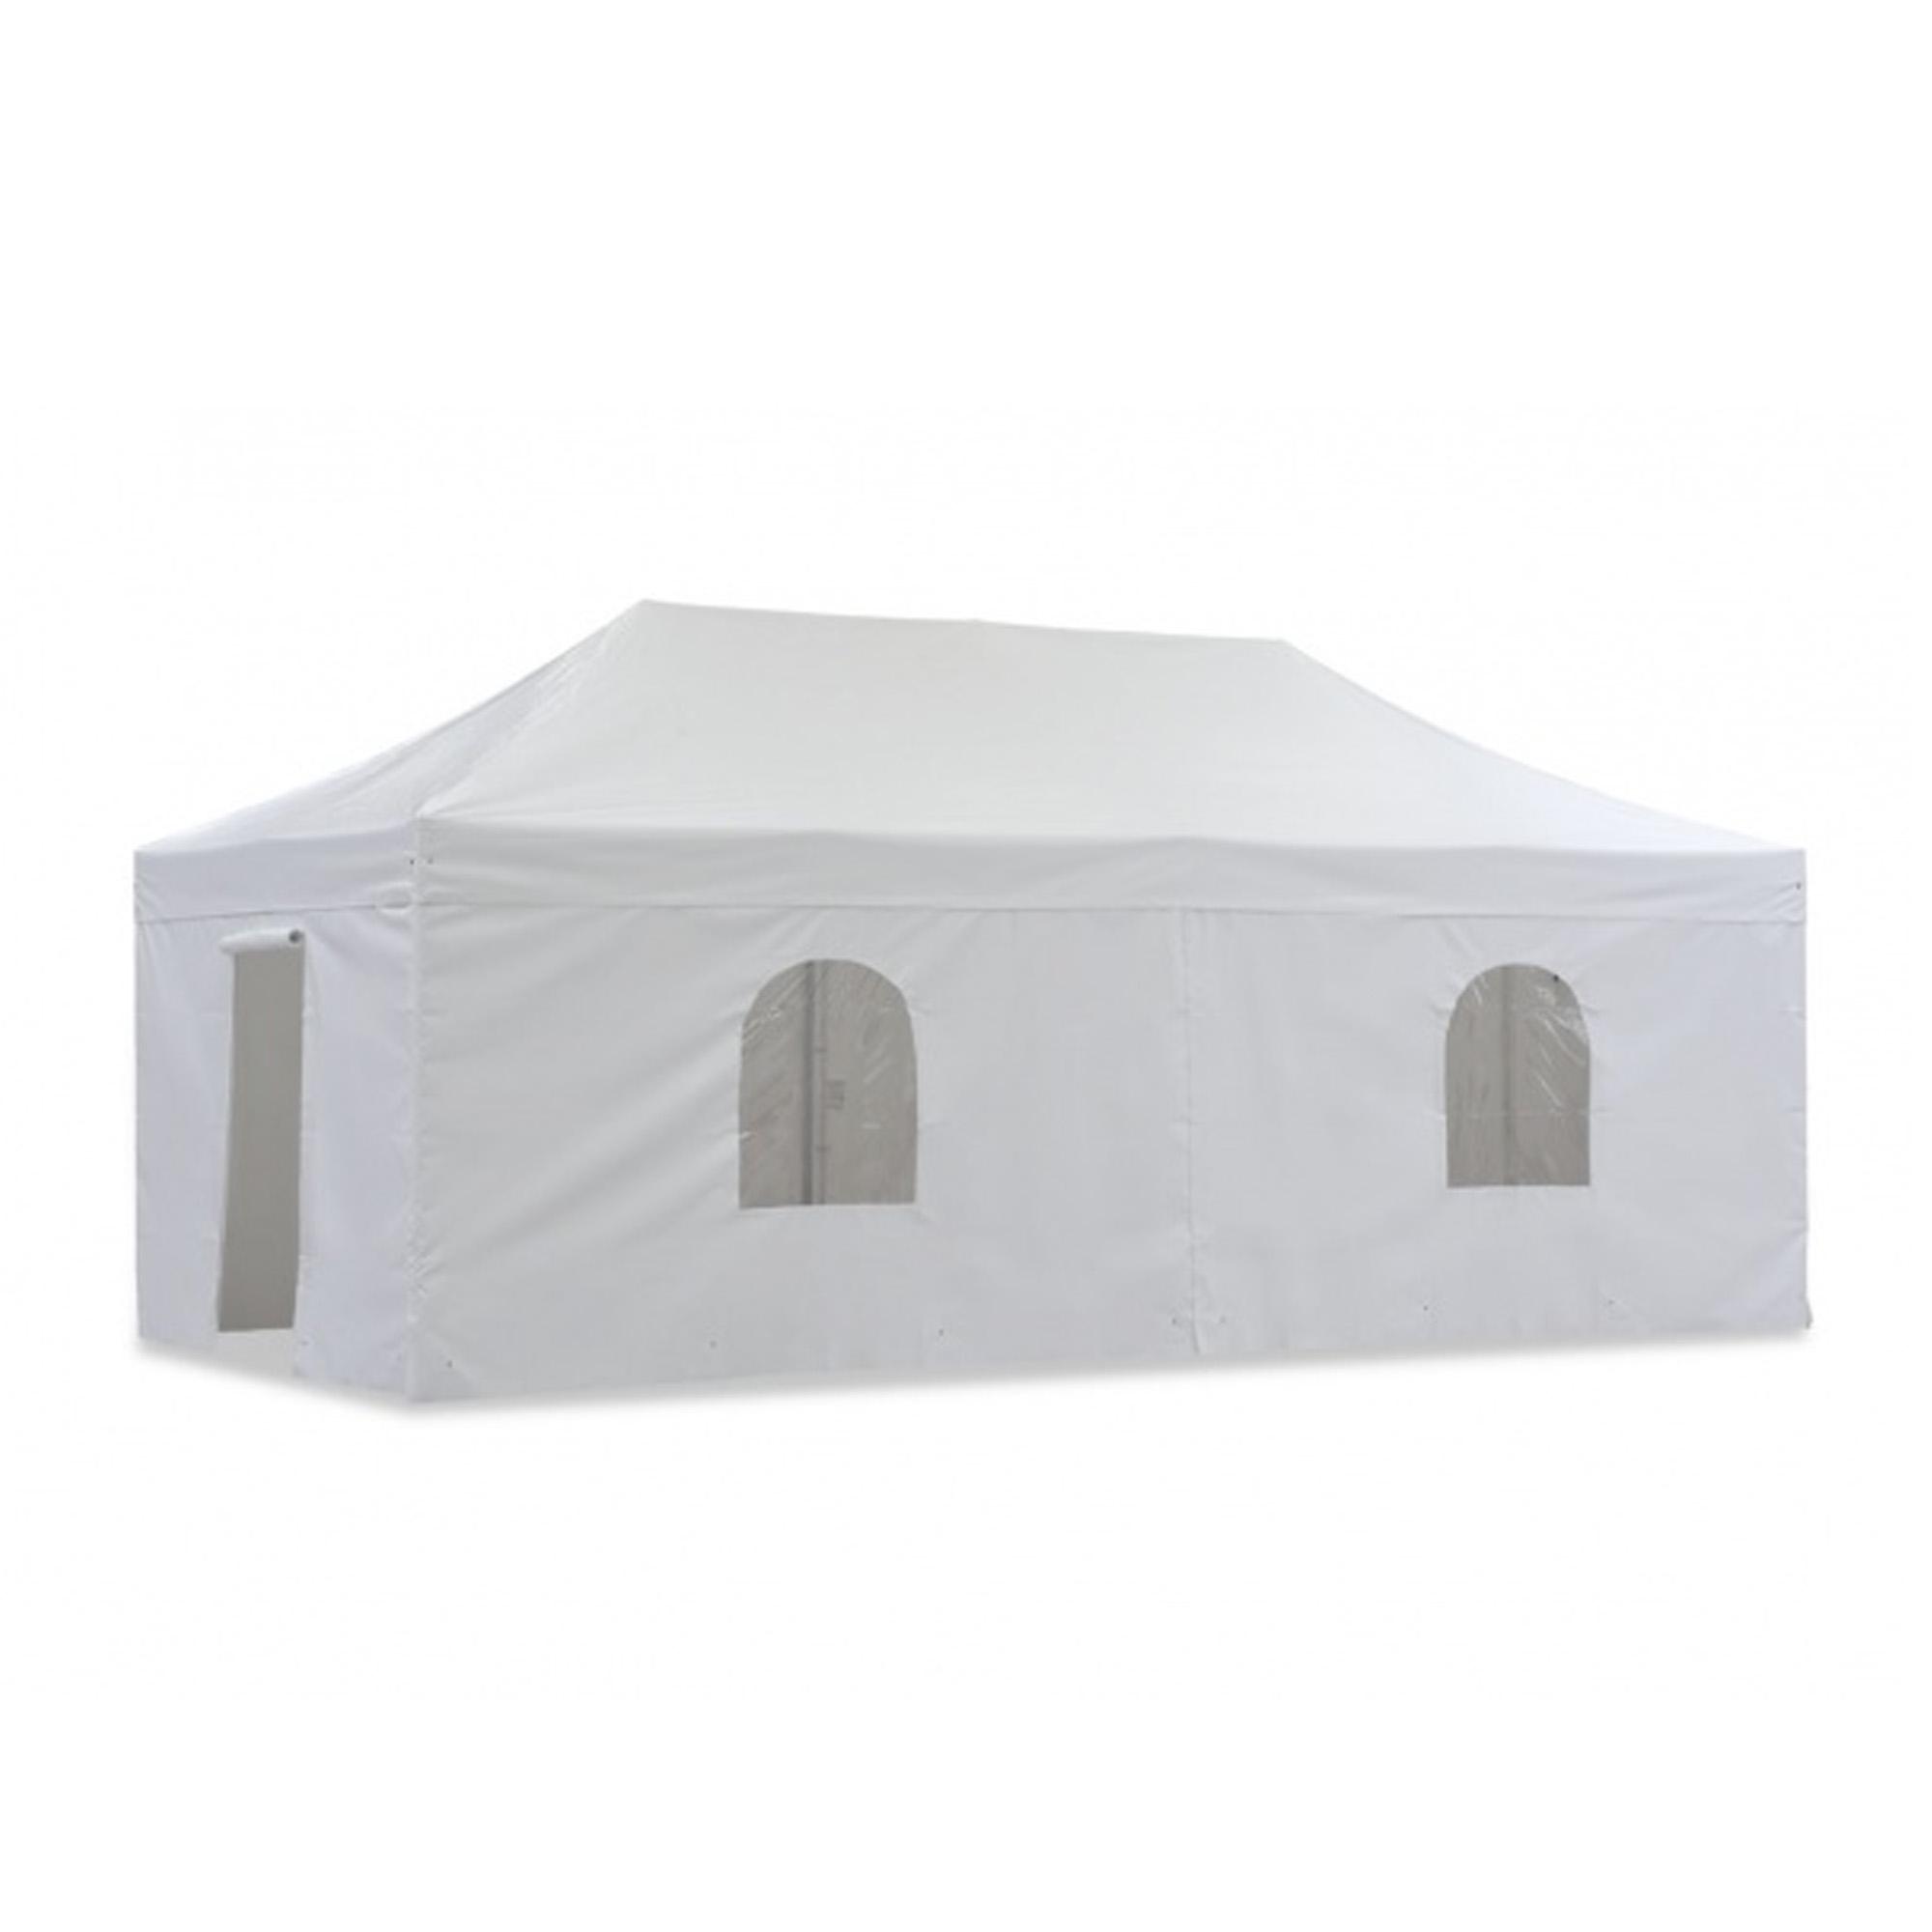 hexa pavillon pvc 3 x 6 m g nstig kaufen. Black Bedroom Furniture Sets. Home Design Ideas